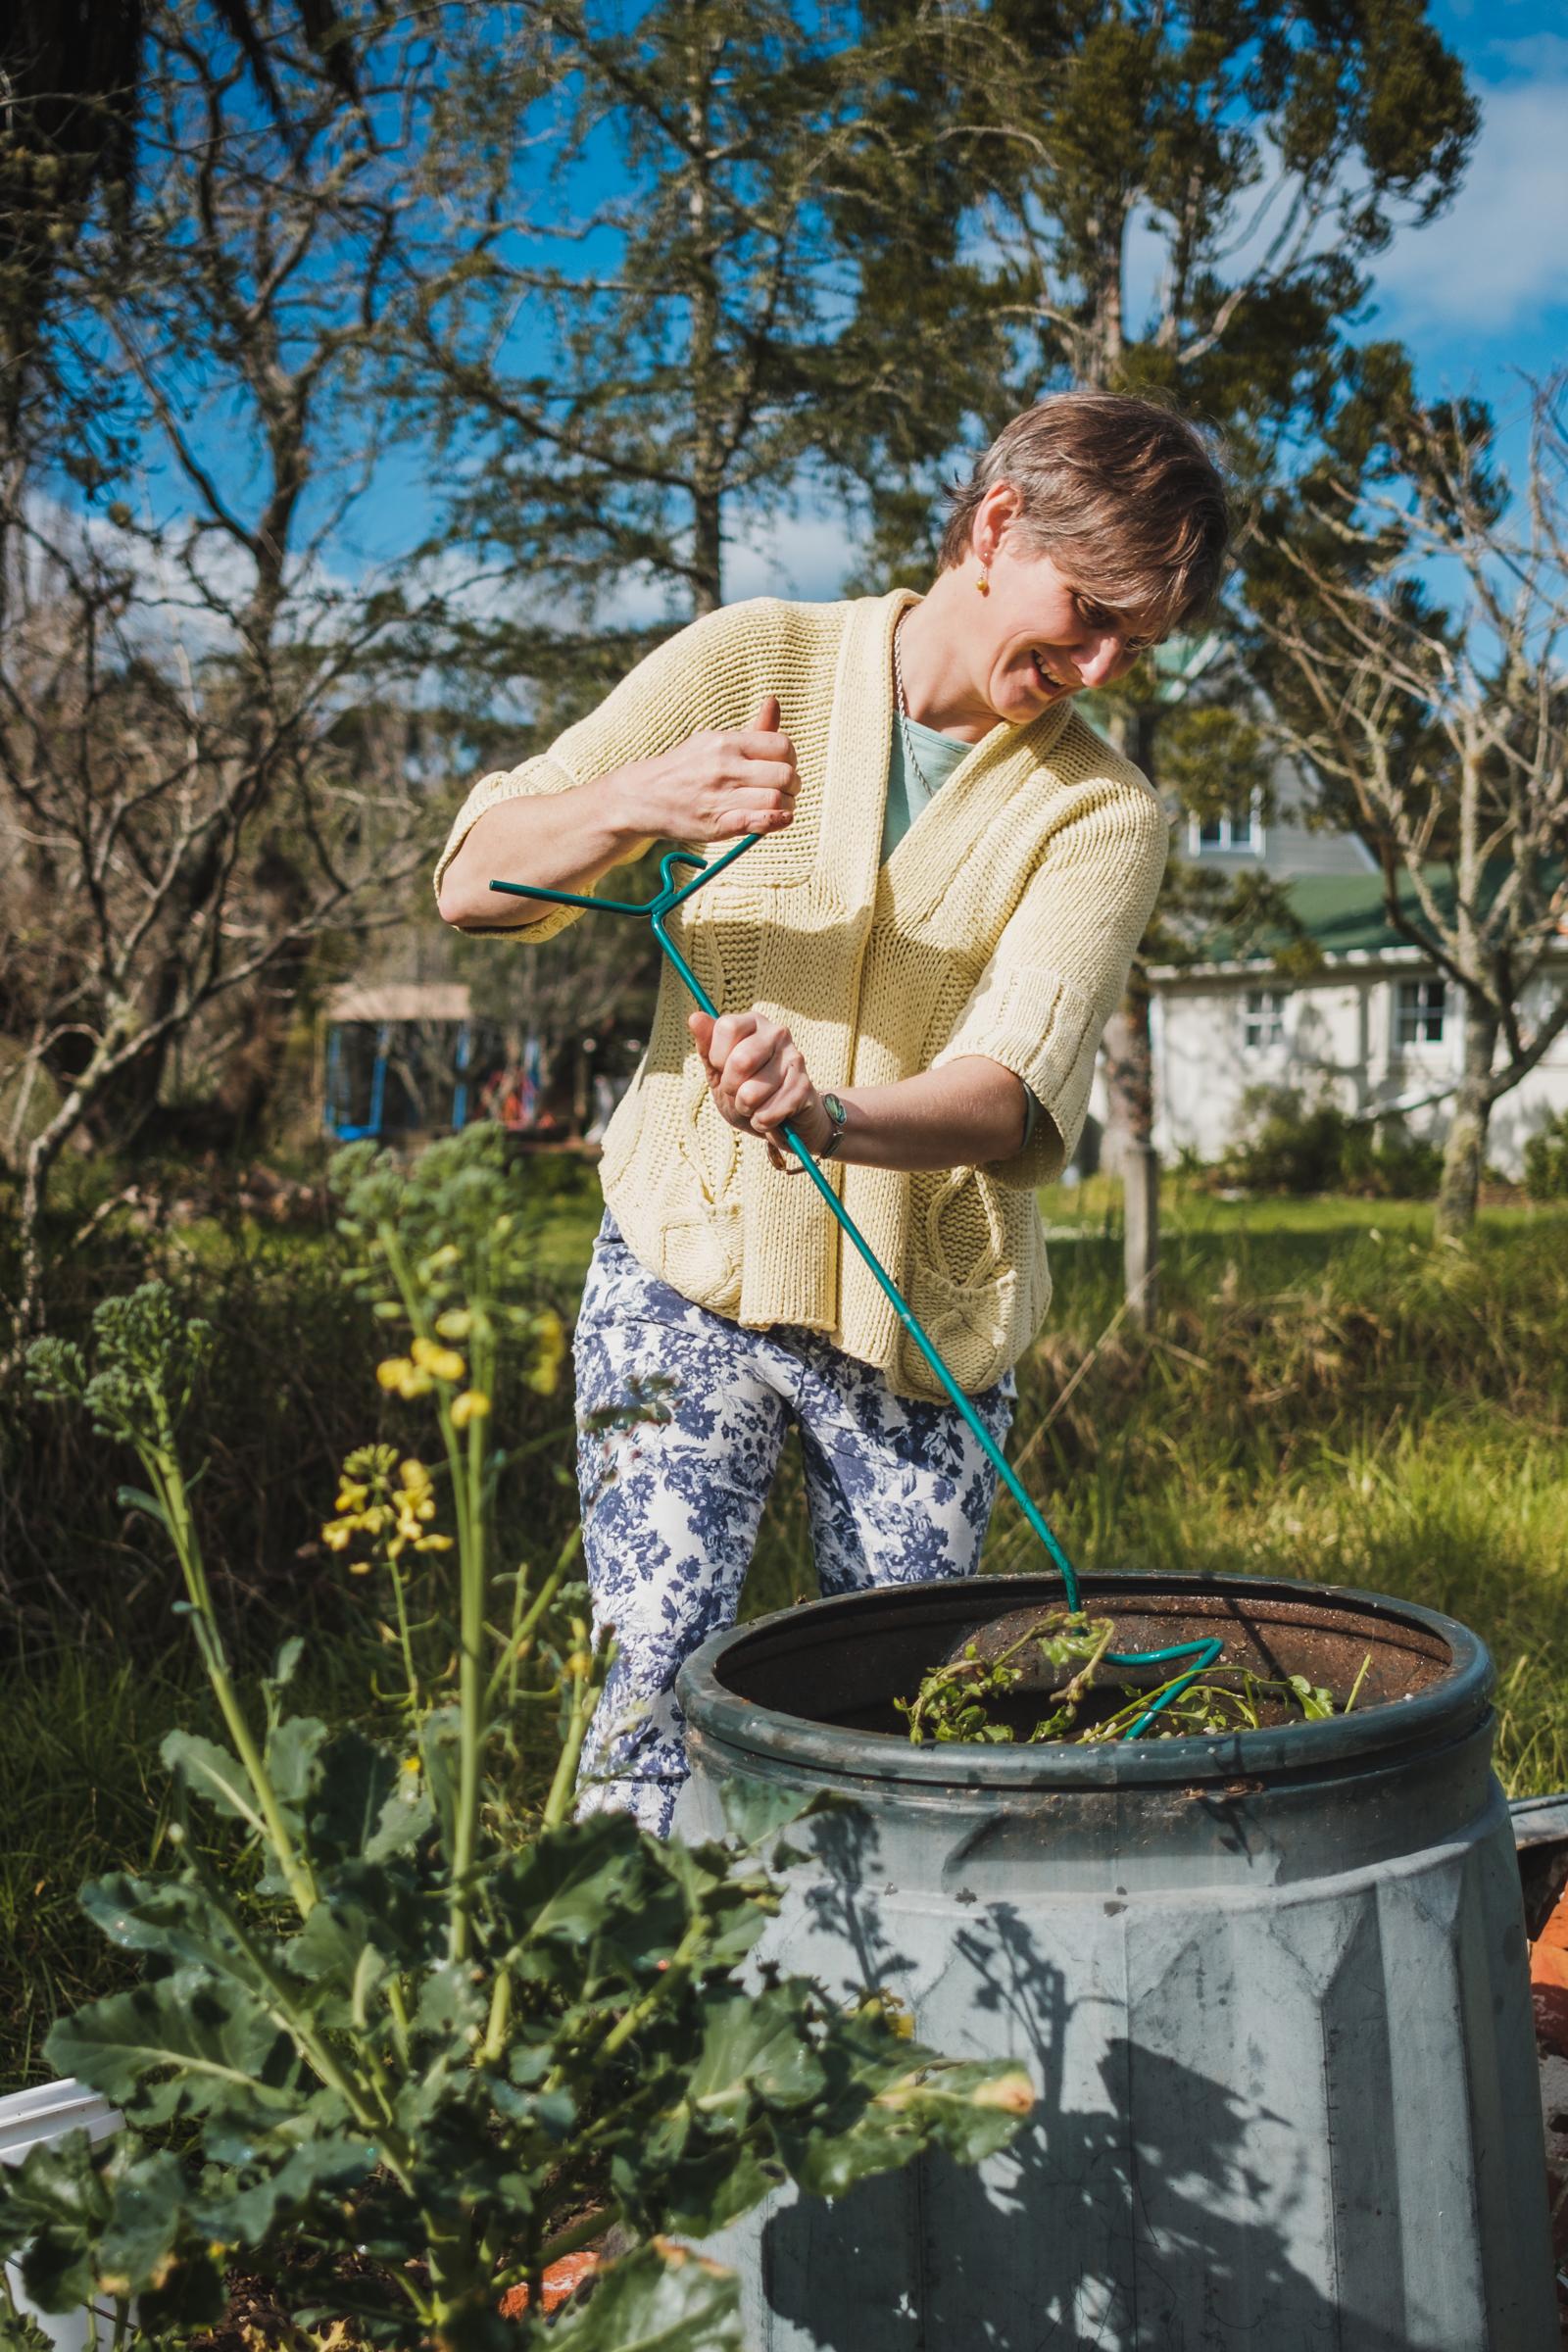 Katrina with compost aerator